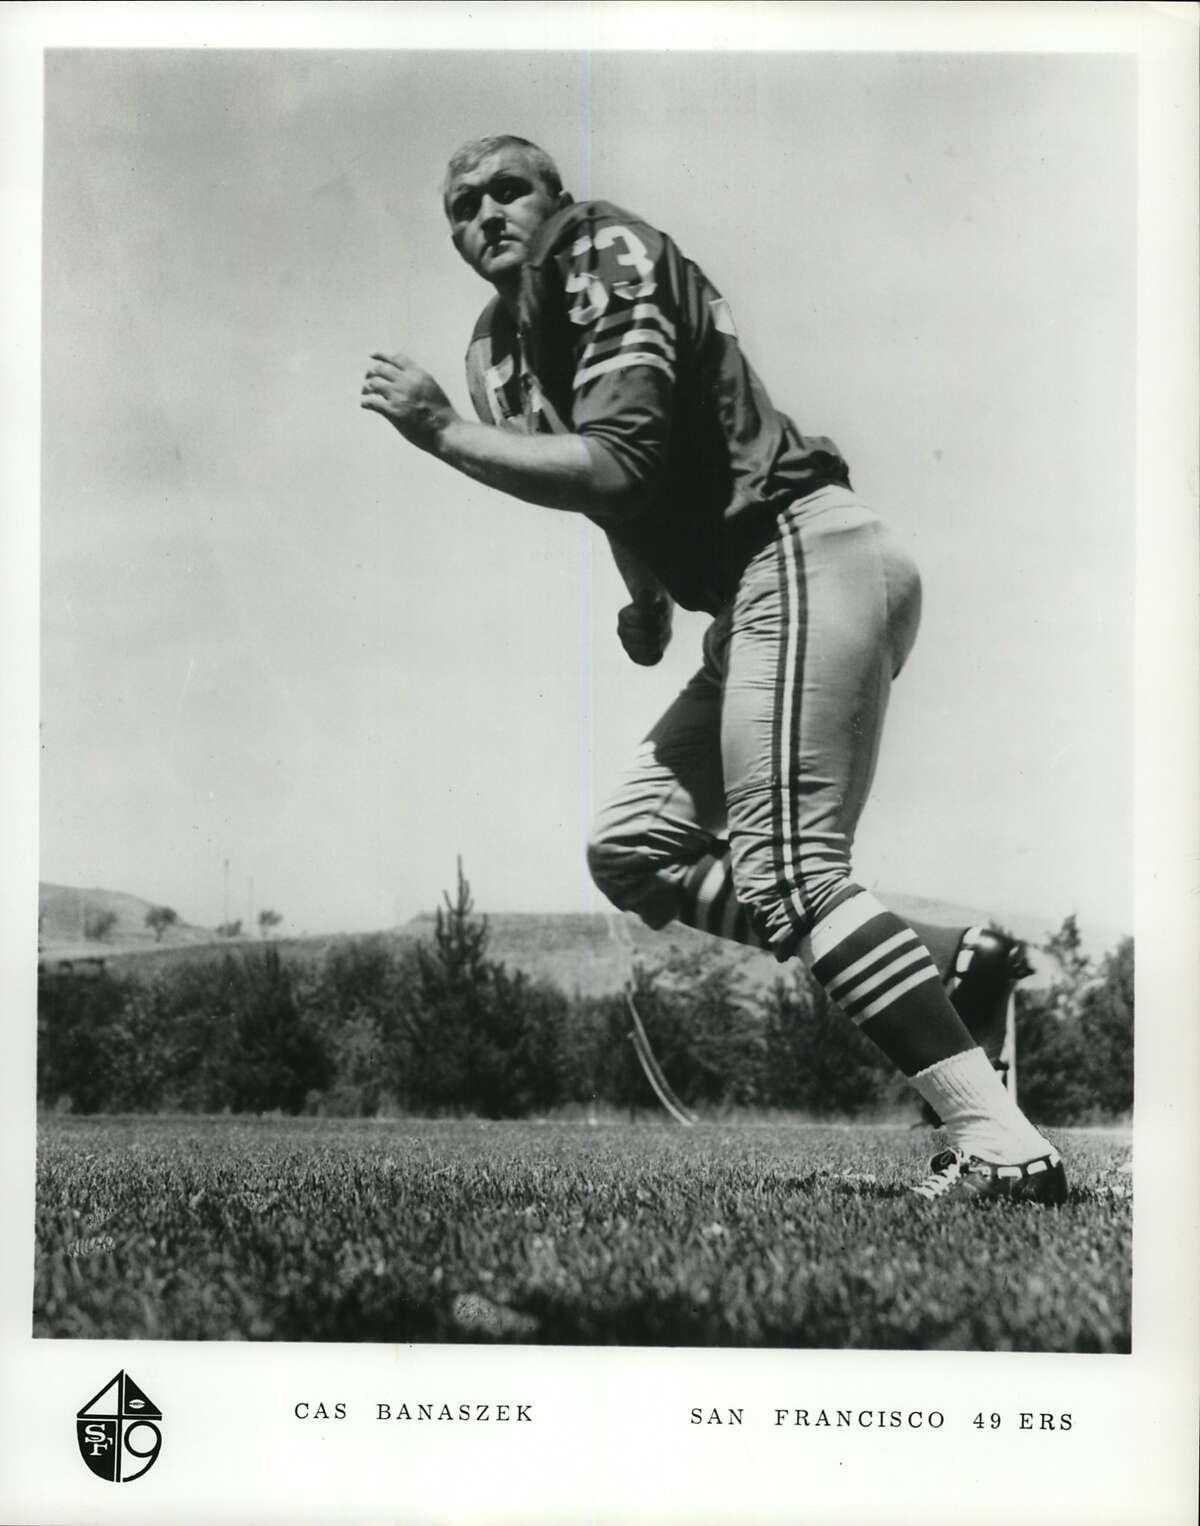 Cas Banaszek, San Francisco 49ers.